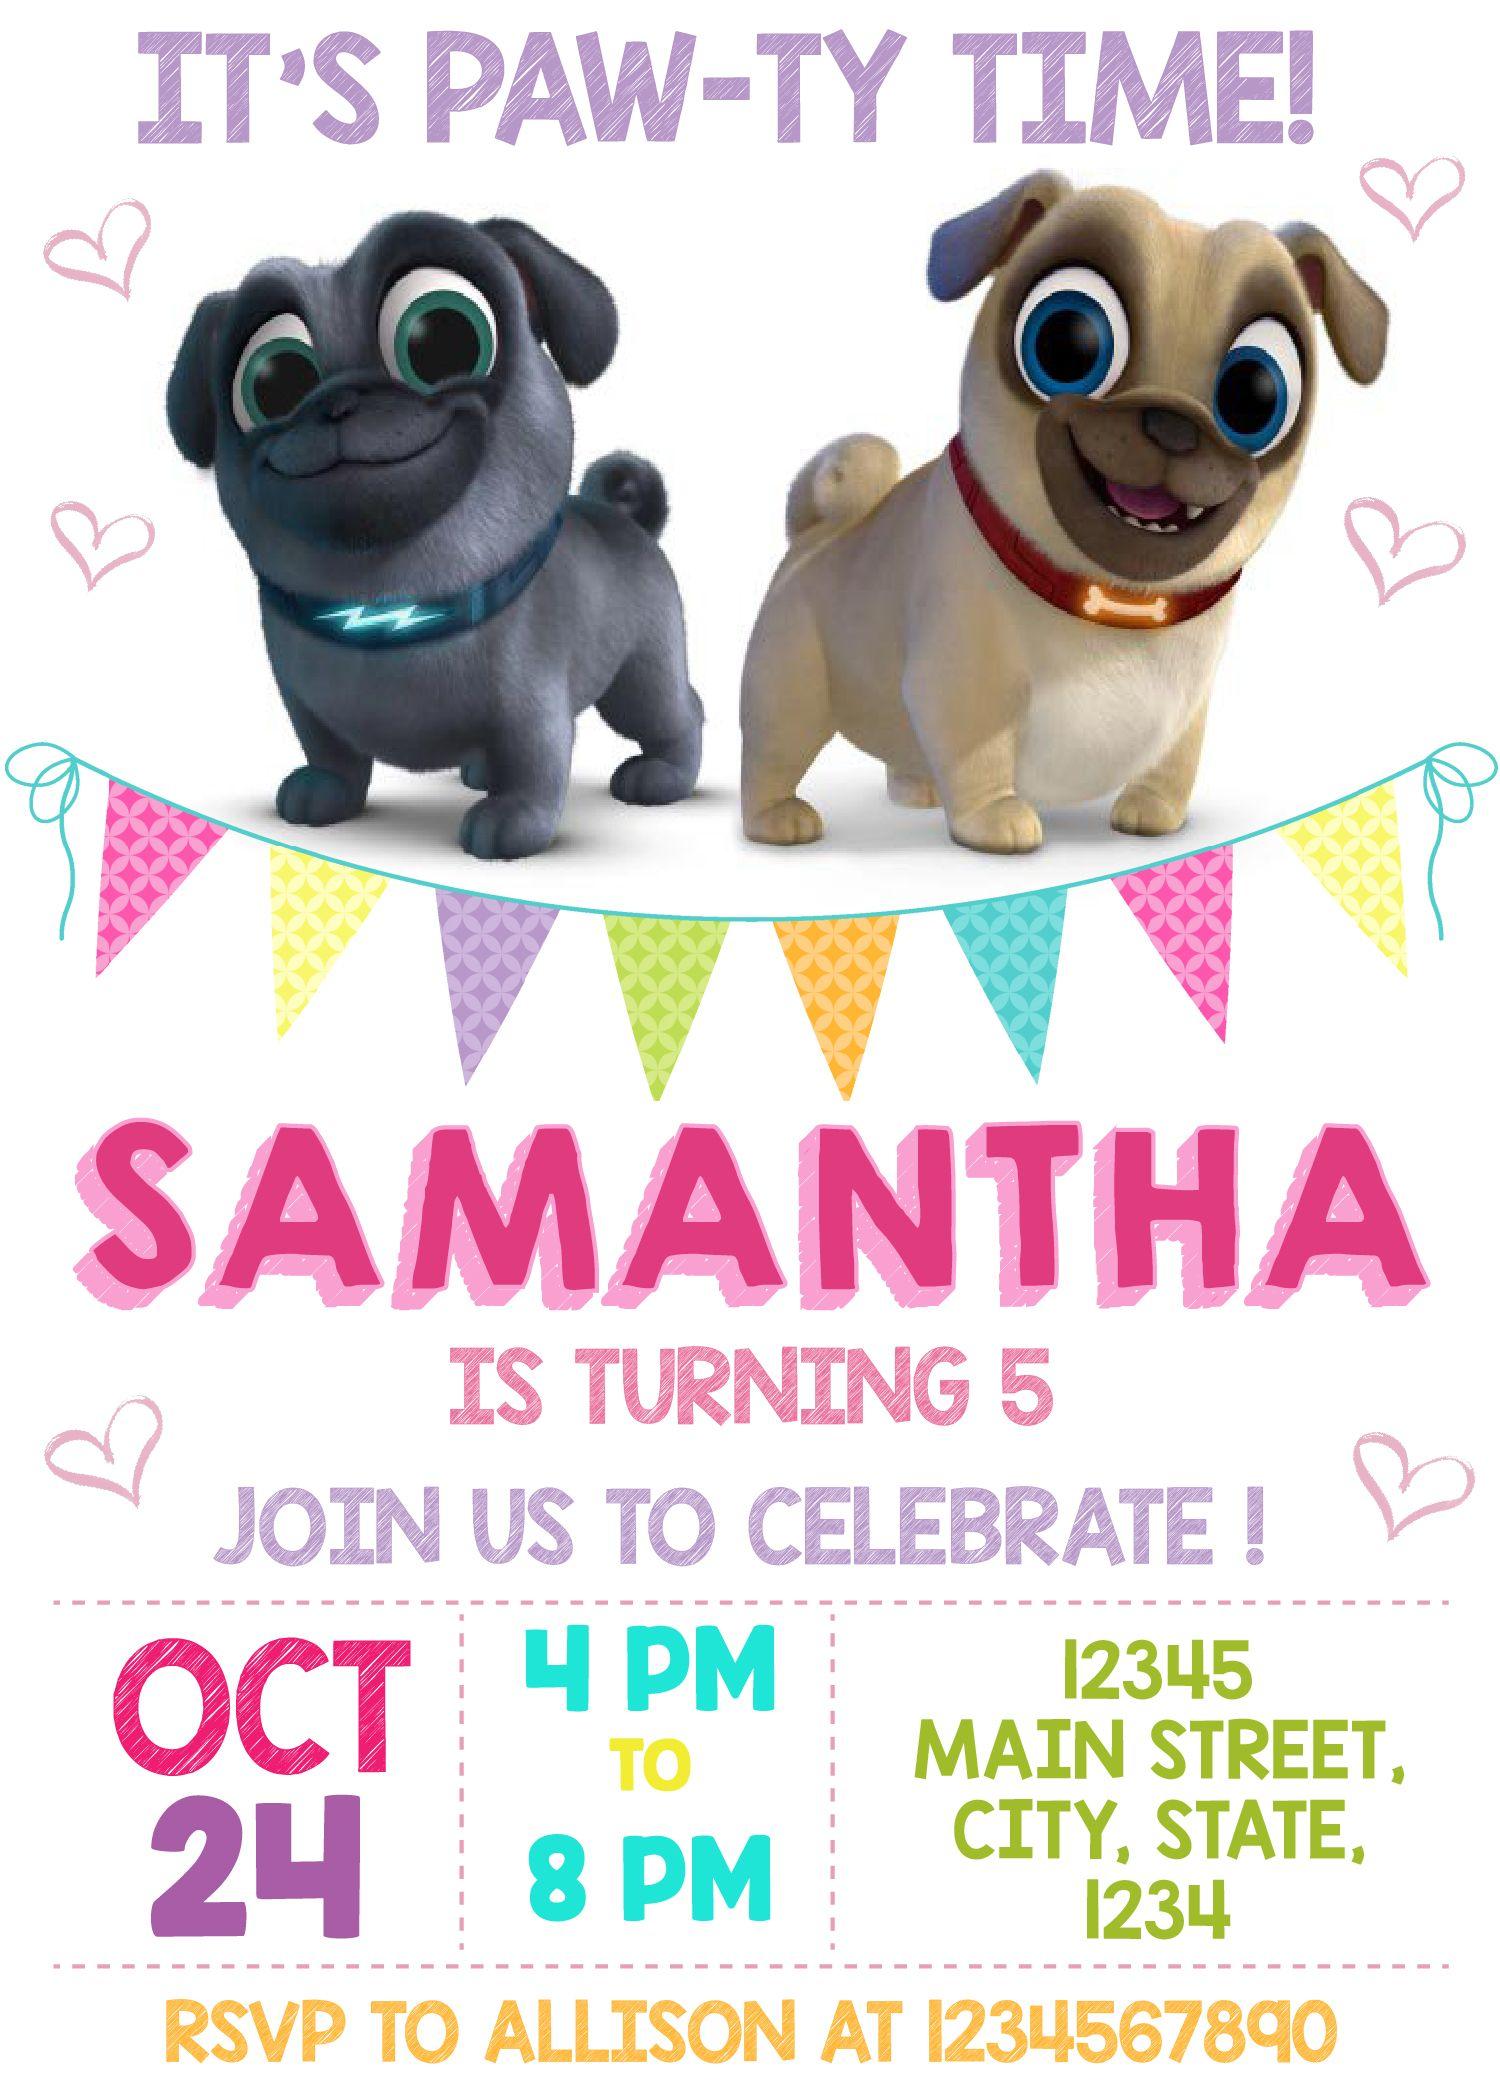 Puppy Dog Pals Printed Invitation Puppy Dog Pals Invite Puppy Dog Pals Puppy Dog Pals Puppy Dog Pal Puppy Dog Pals Puppy Birthday Parties Puppy Birthday